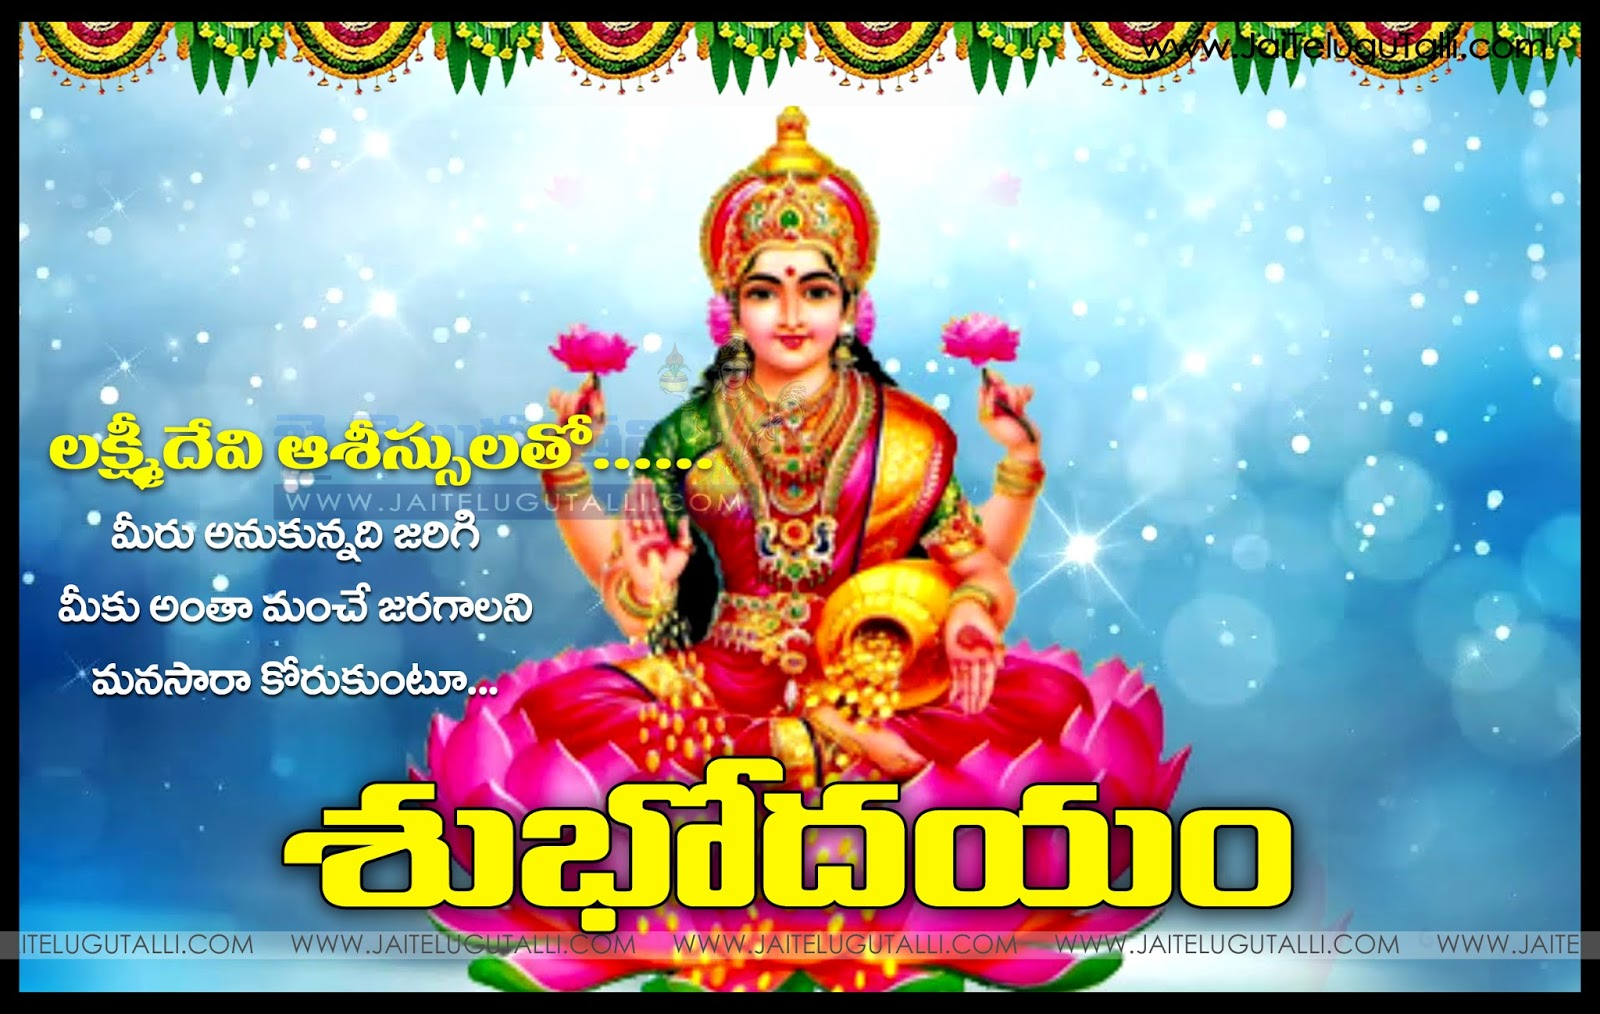 Goddess Lakshmi Devi Pictures Best Telugu Good Morning Quotes Images